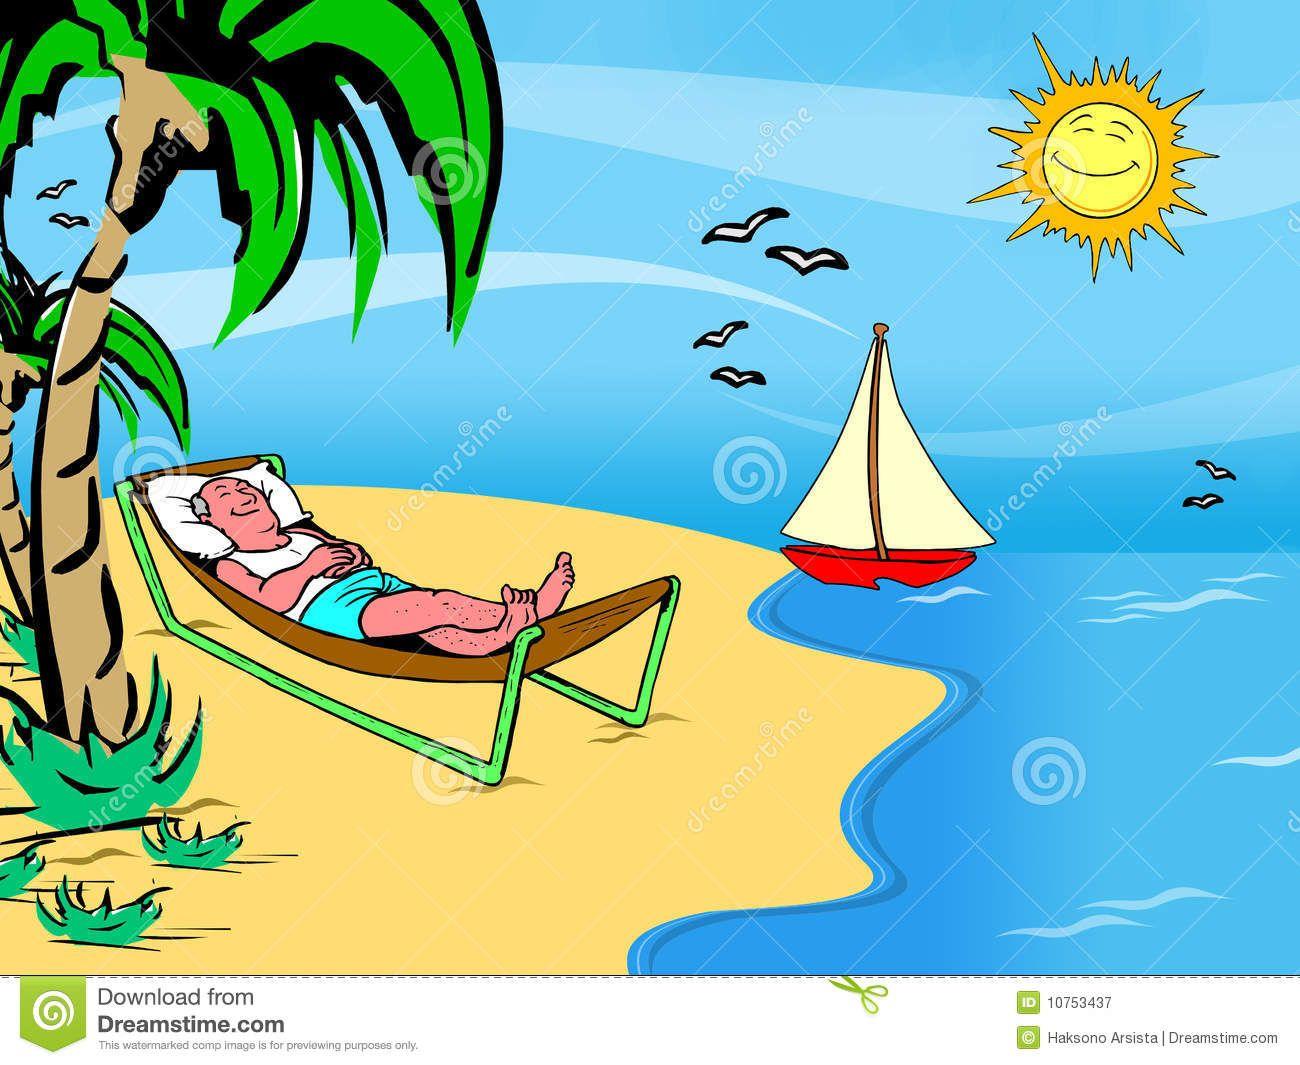 cartoon man on a beach holiday - Holiday Cartoon Images